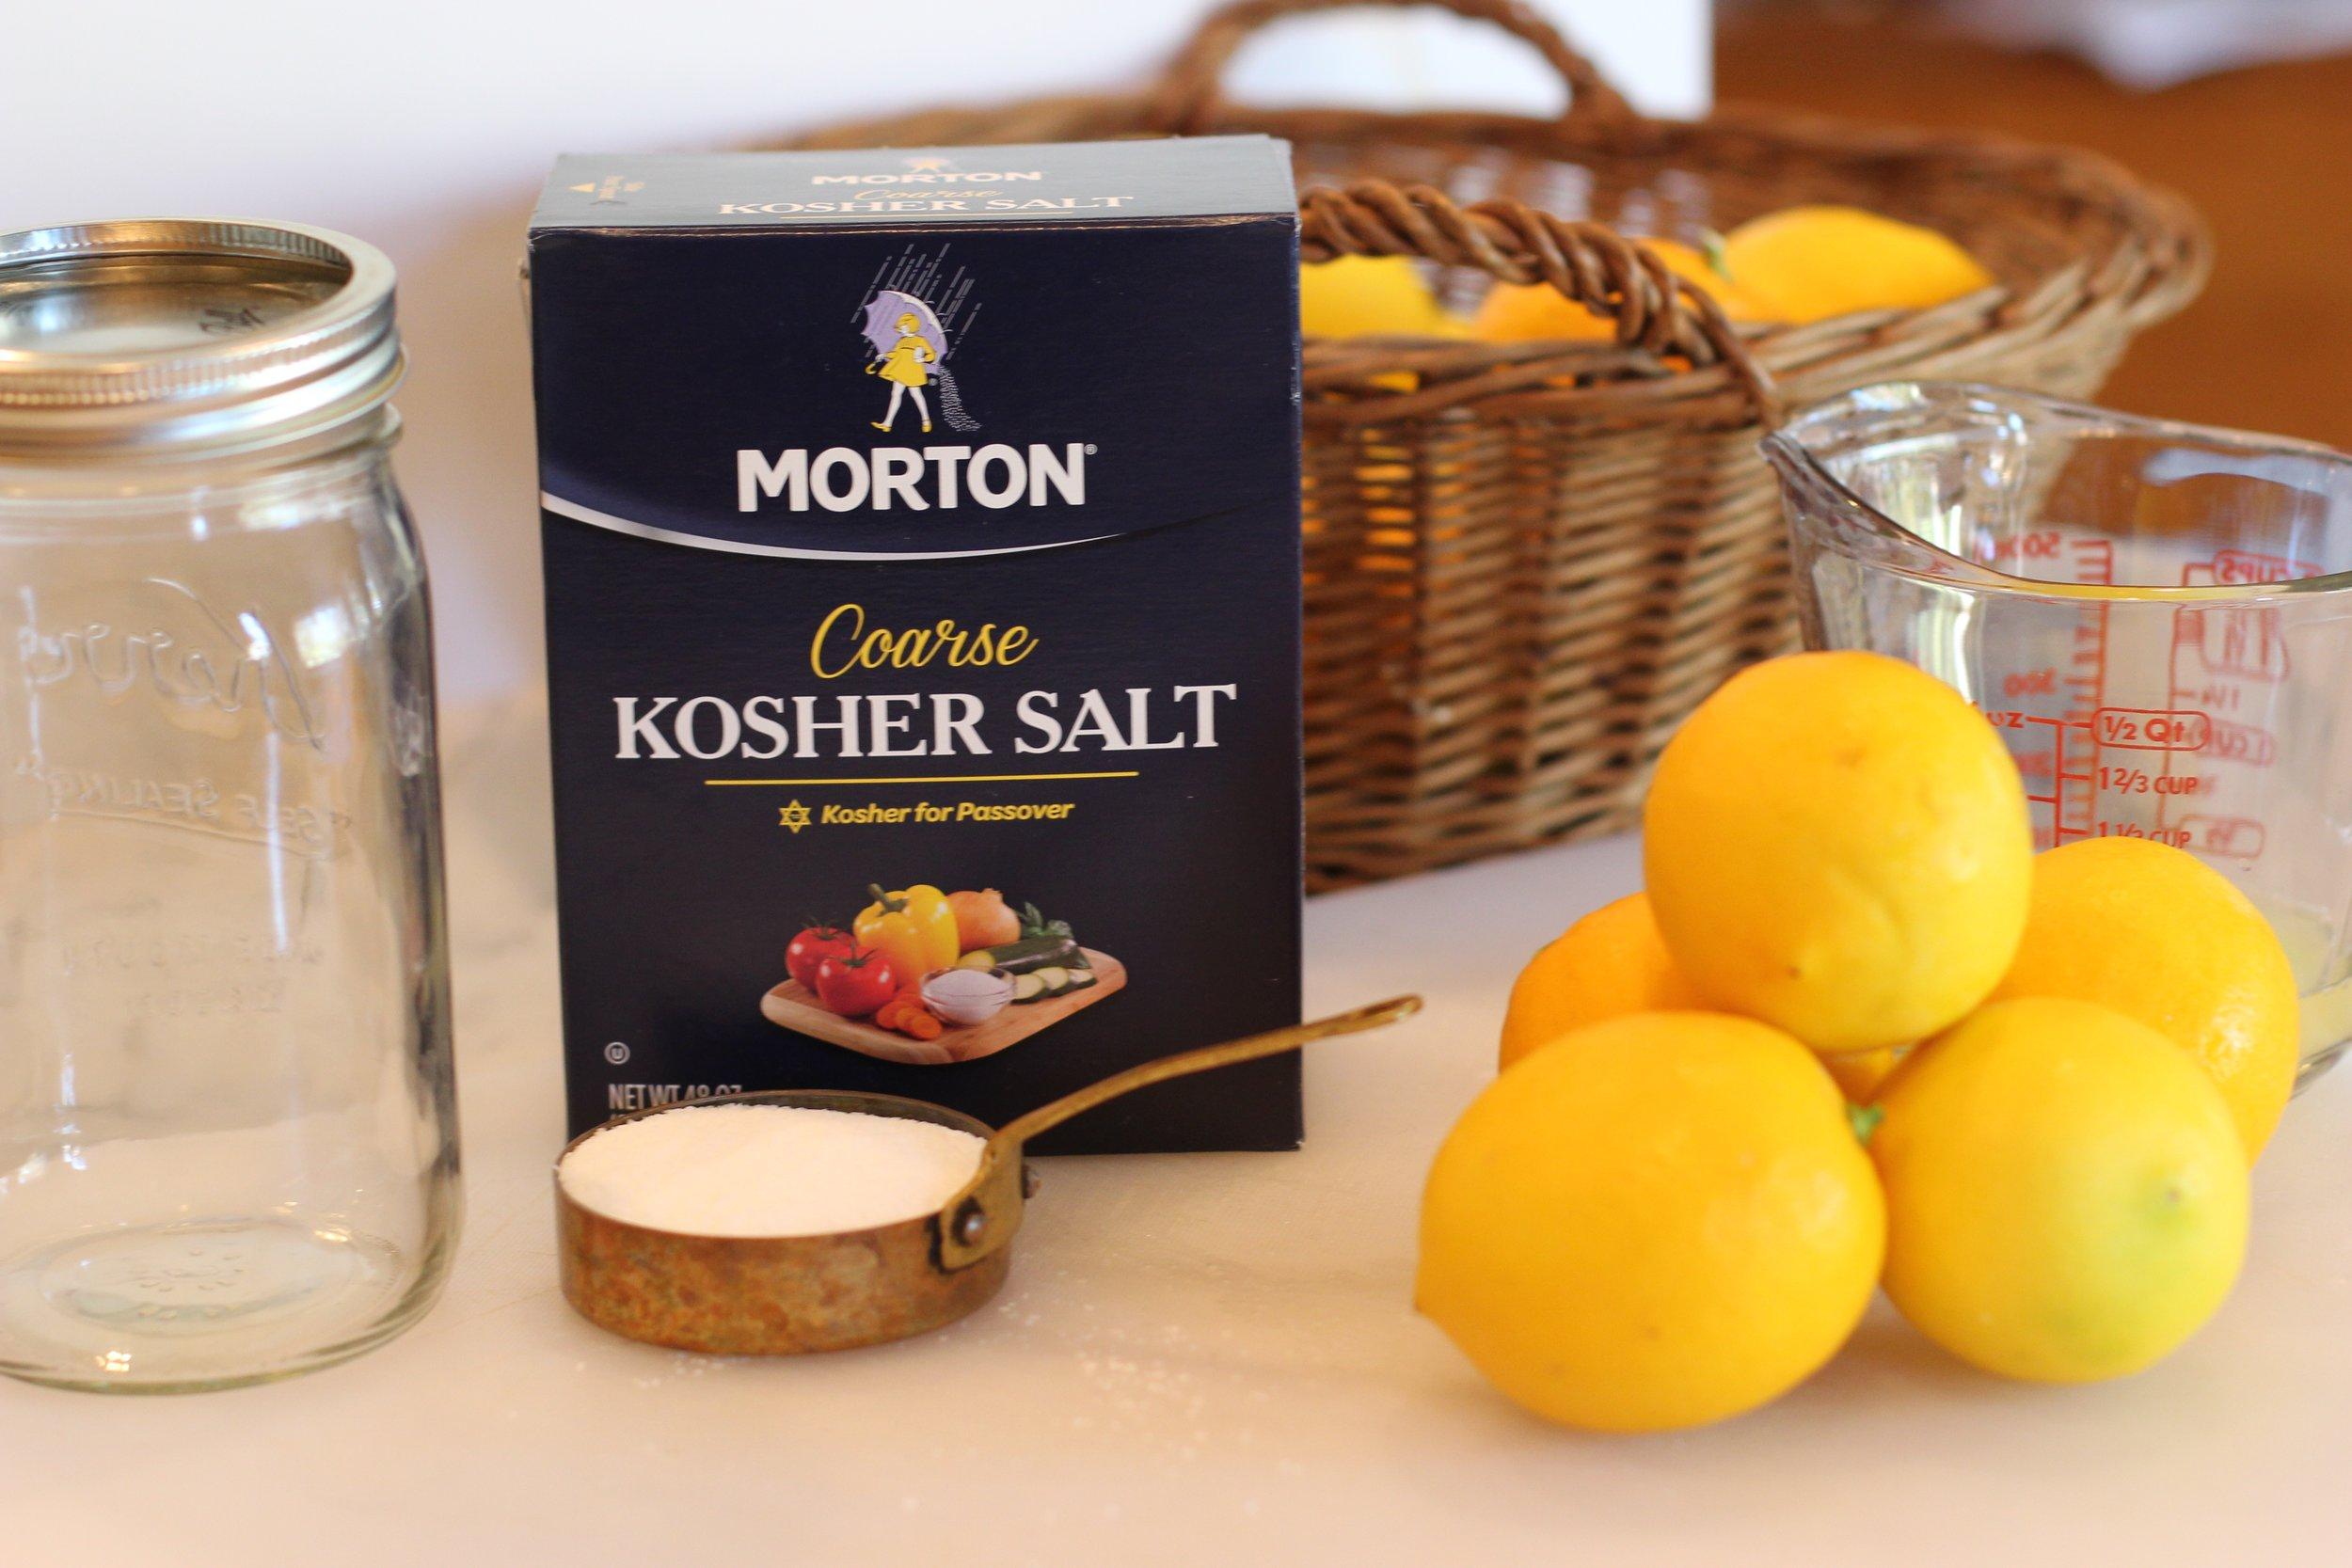 Ingredients - 7 lemons, washed and dried (2 lemon for juicing)1/3 cup kosher salt